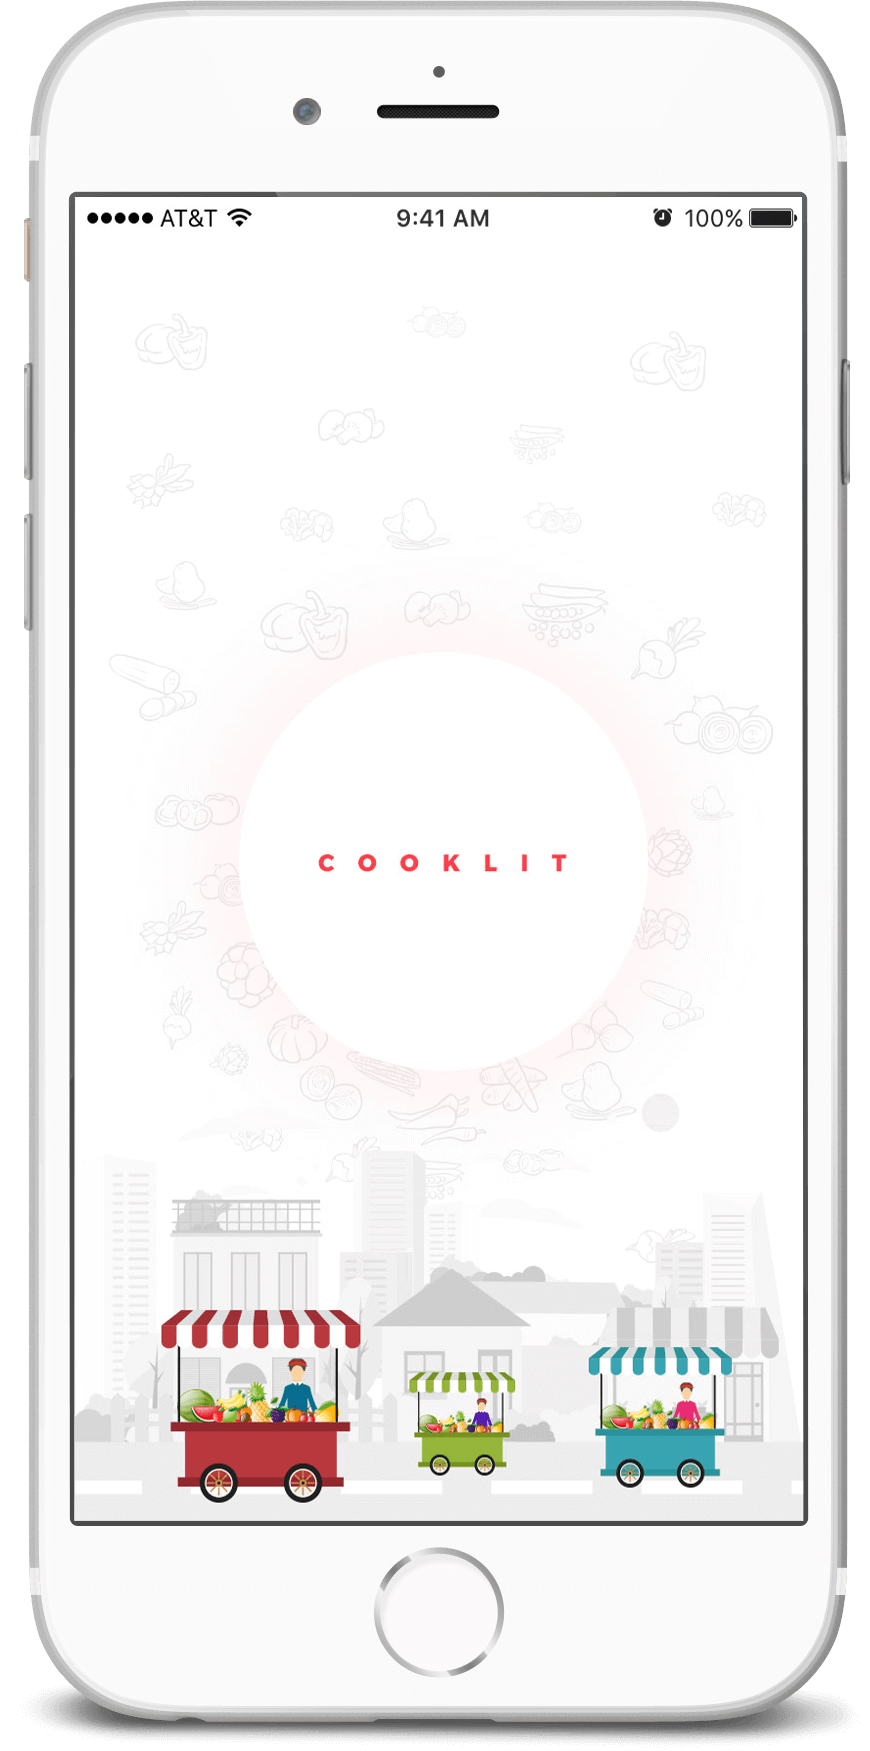 cooklit app